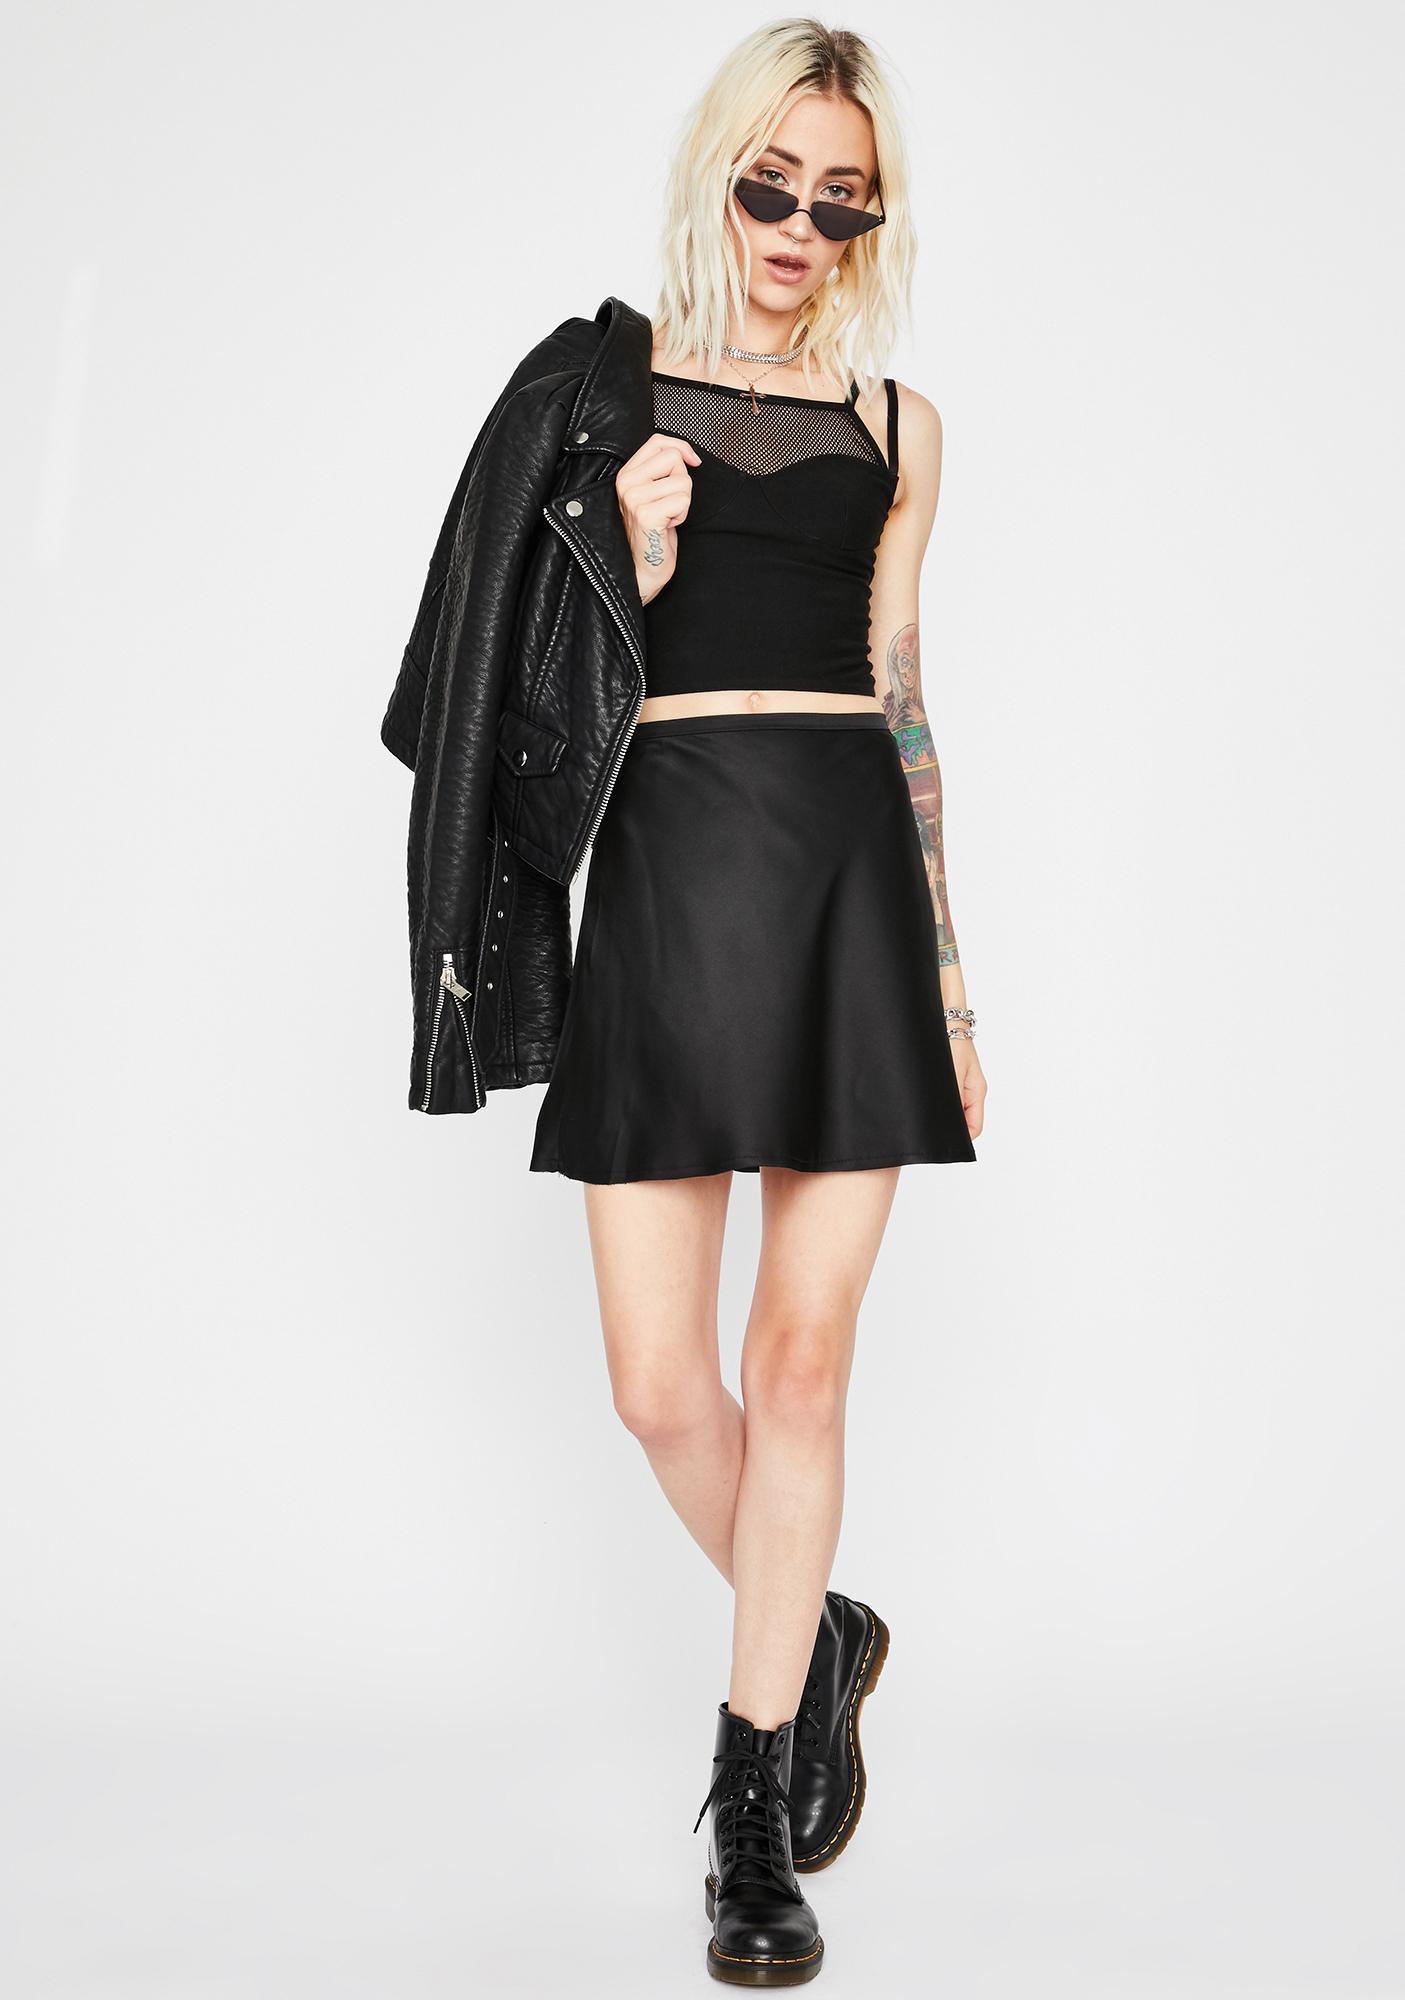 Wicked Flash Forward Silky Skirt